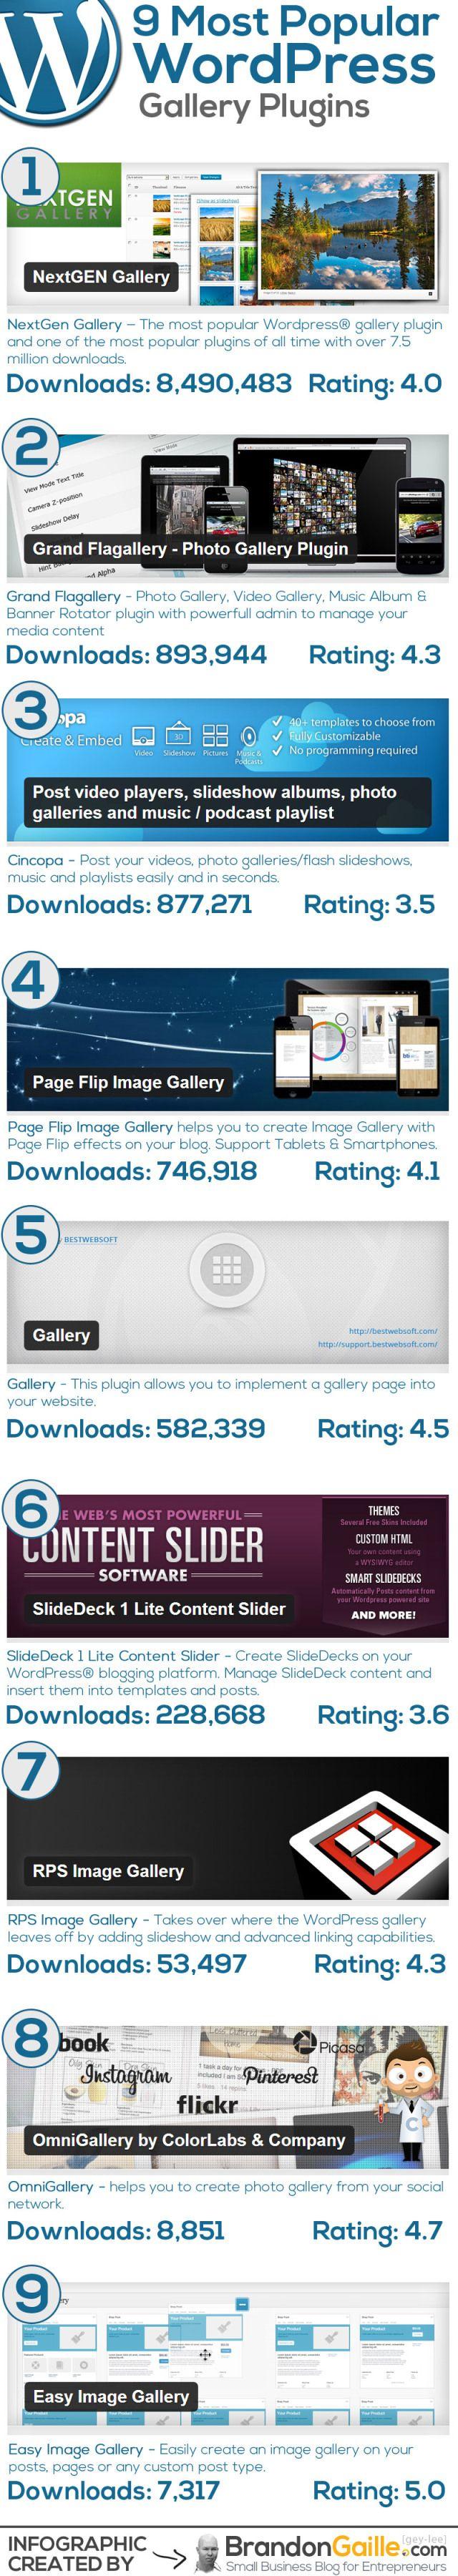 9 Most Popular Word Press Gallery Plugins C853d672841b5a4ba5d6158dd9f1789d